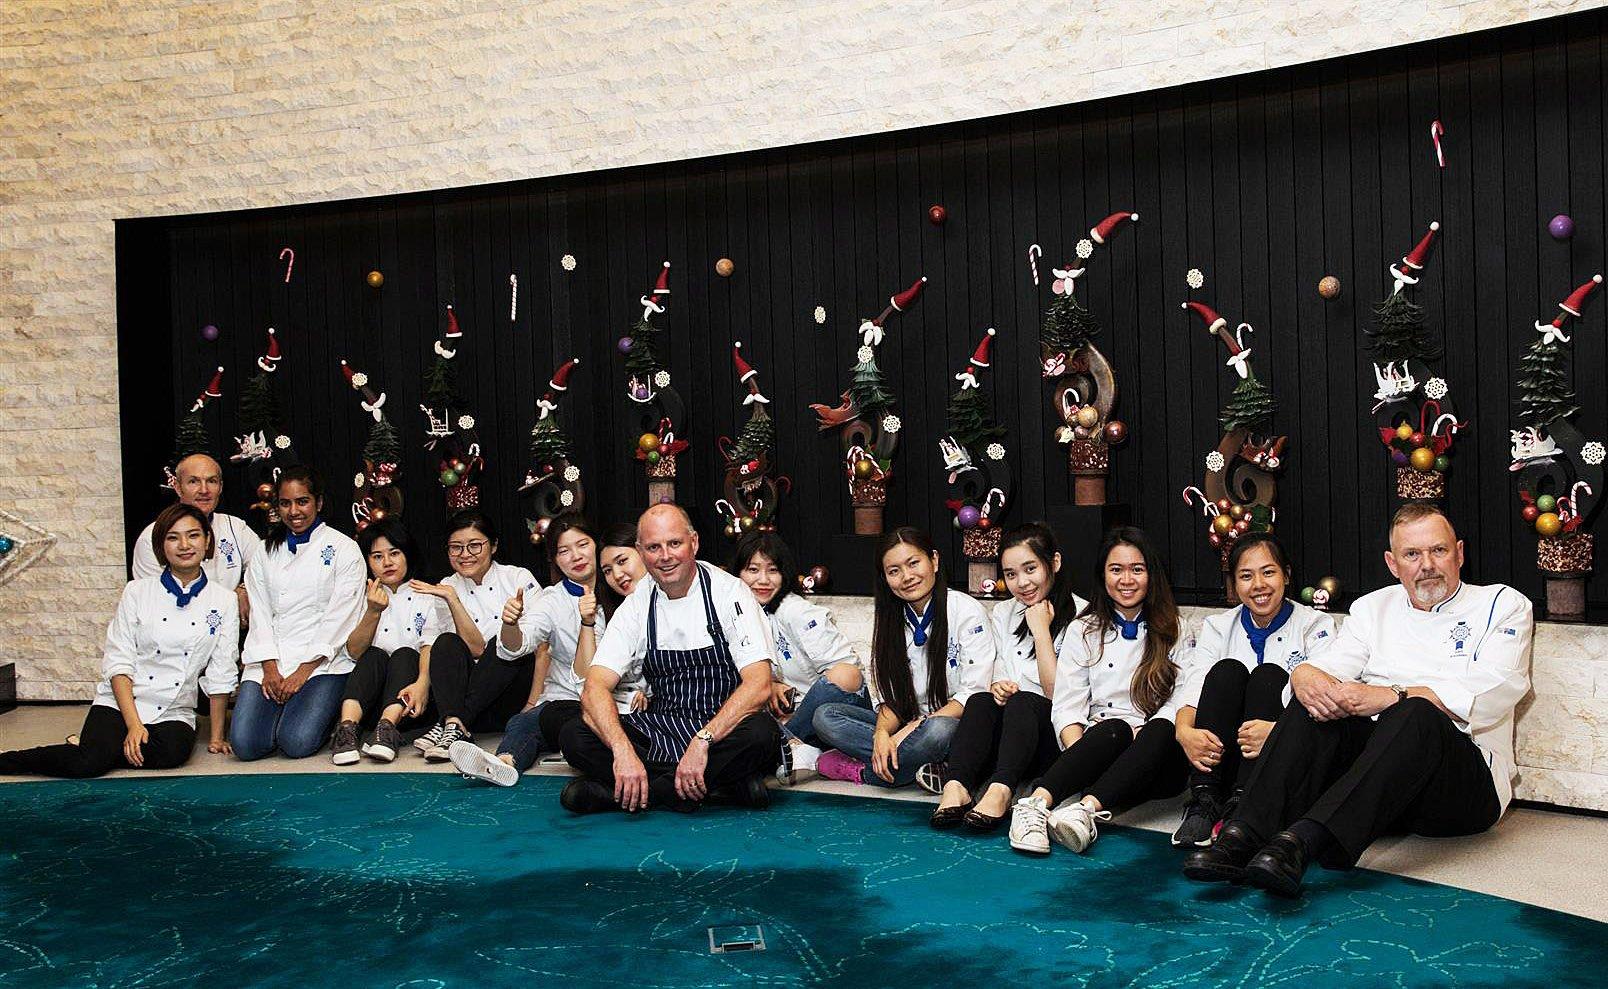 Sydney students impress with giant chocolate showpiece display